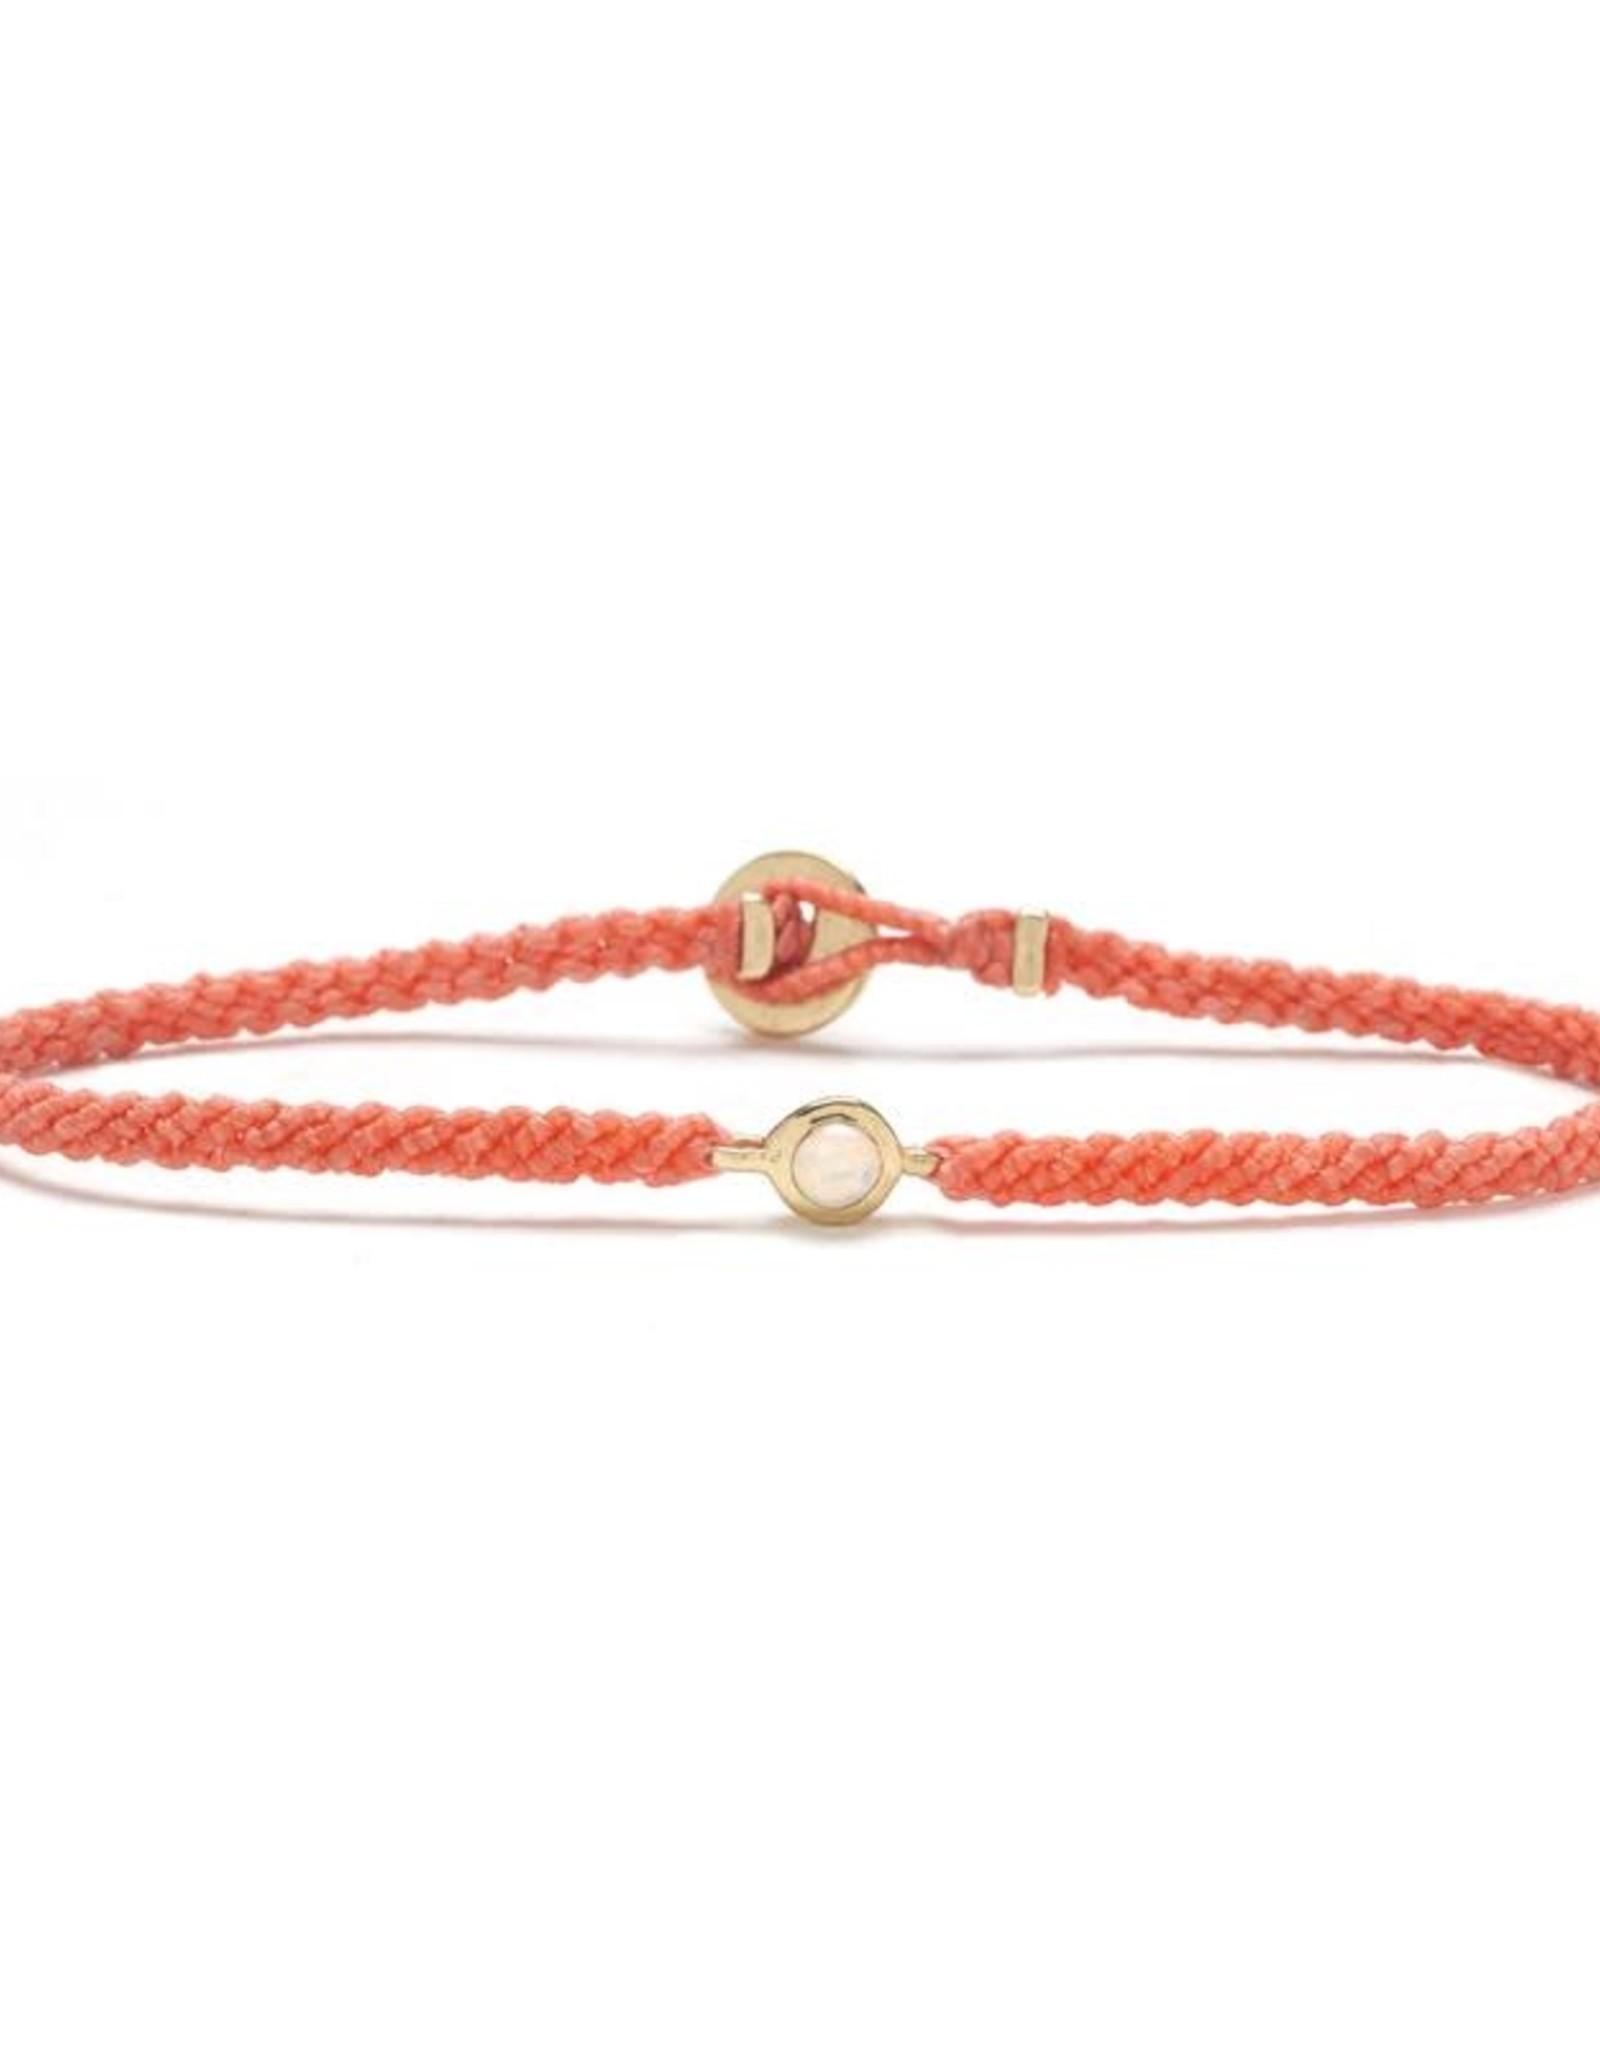 Scosha Candy Macrame Bracelet - Opal + Salmon